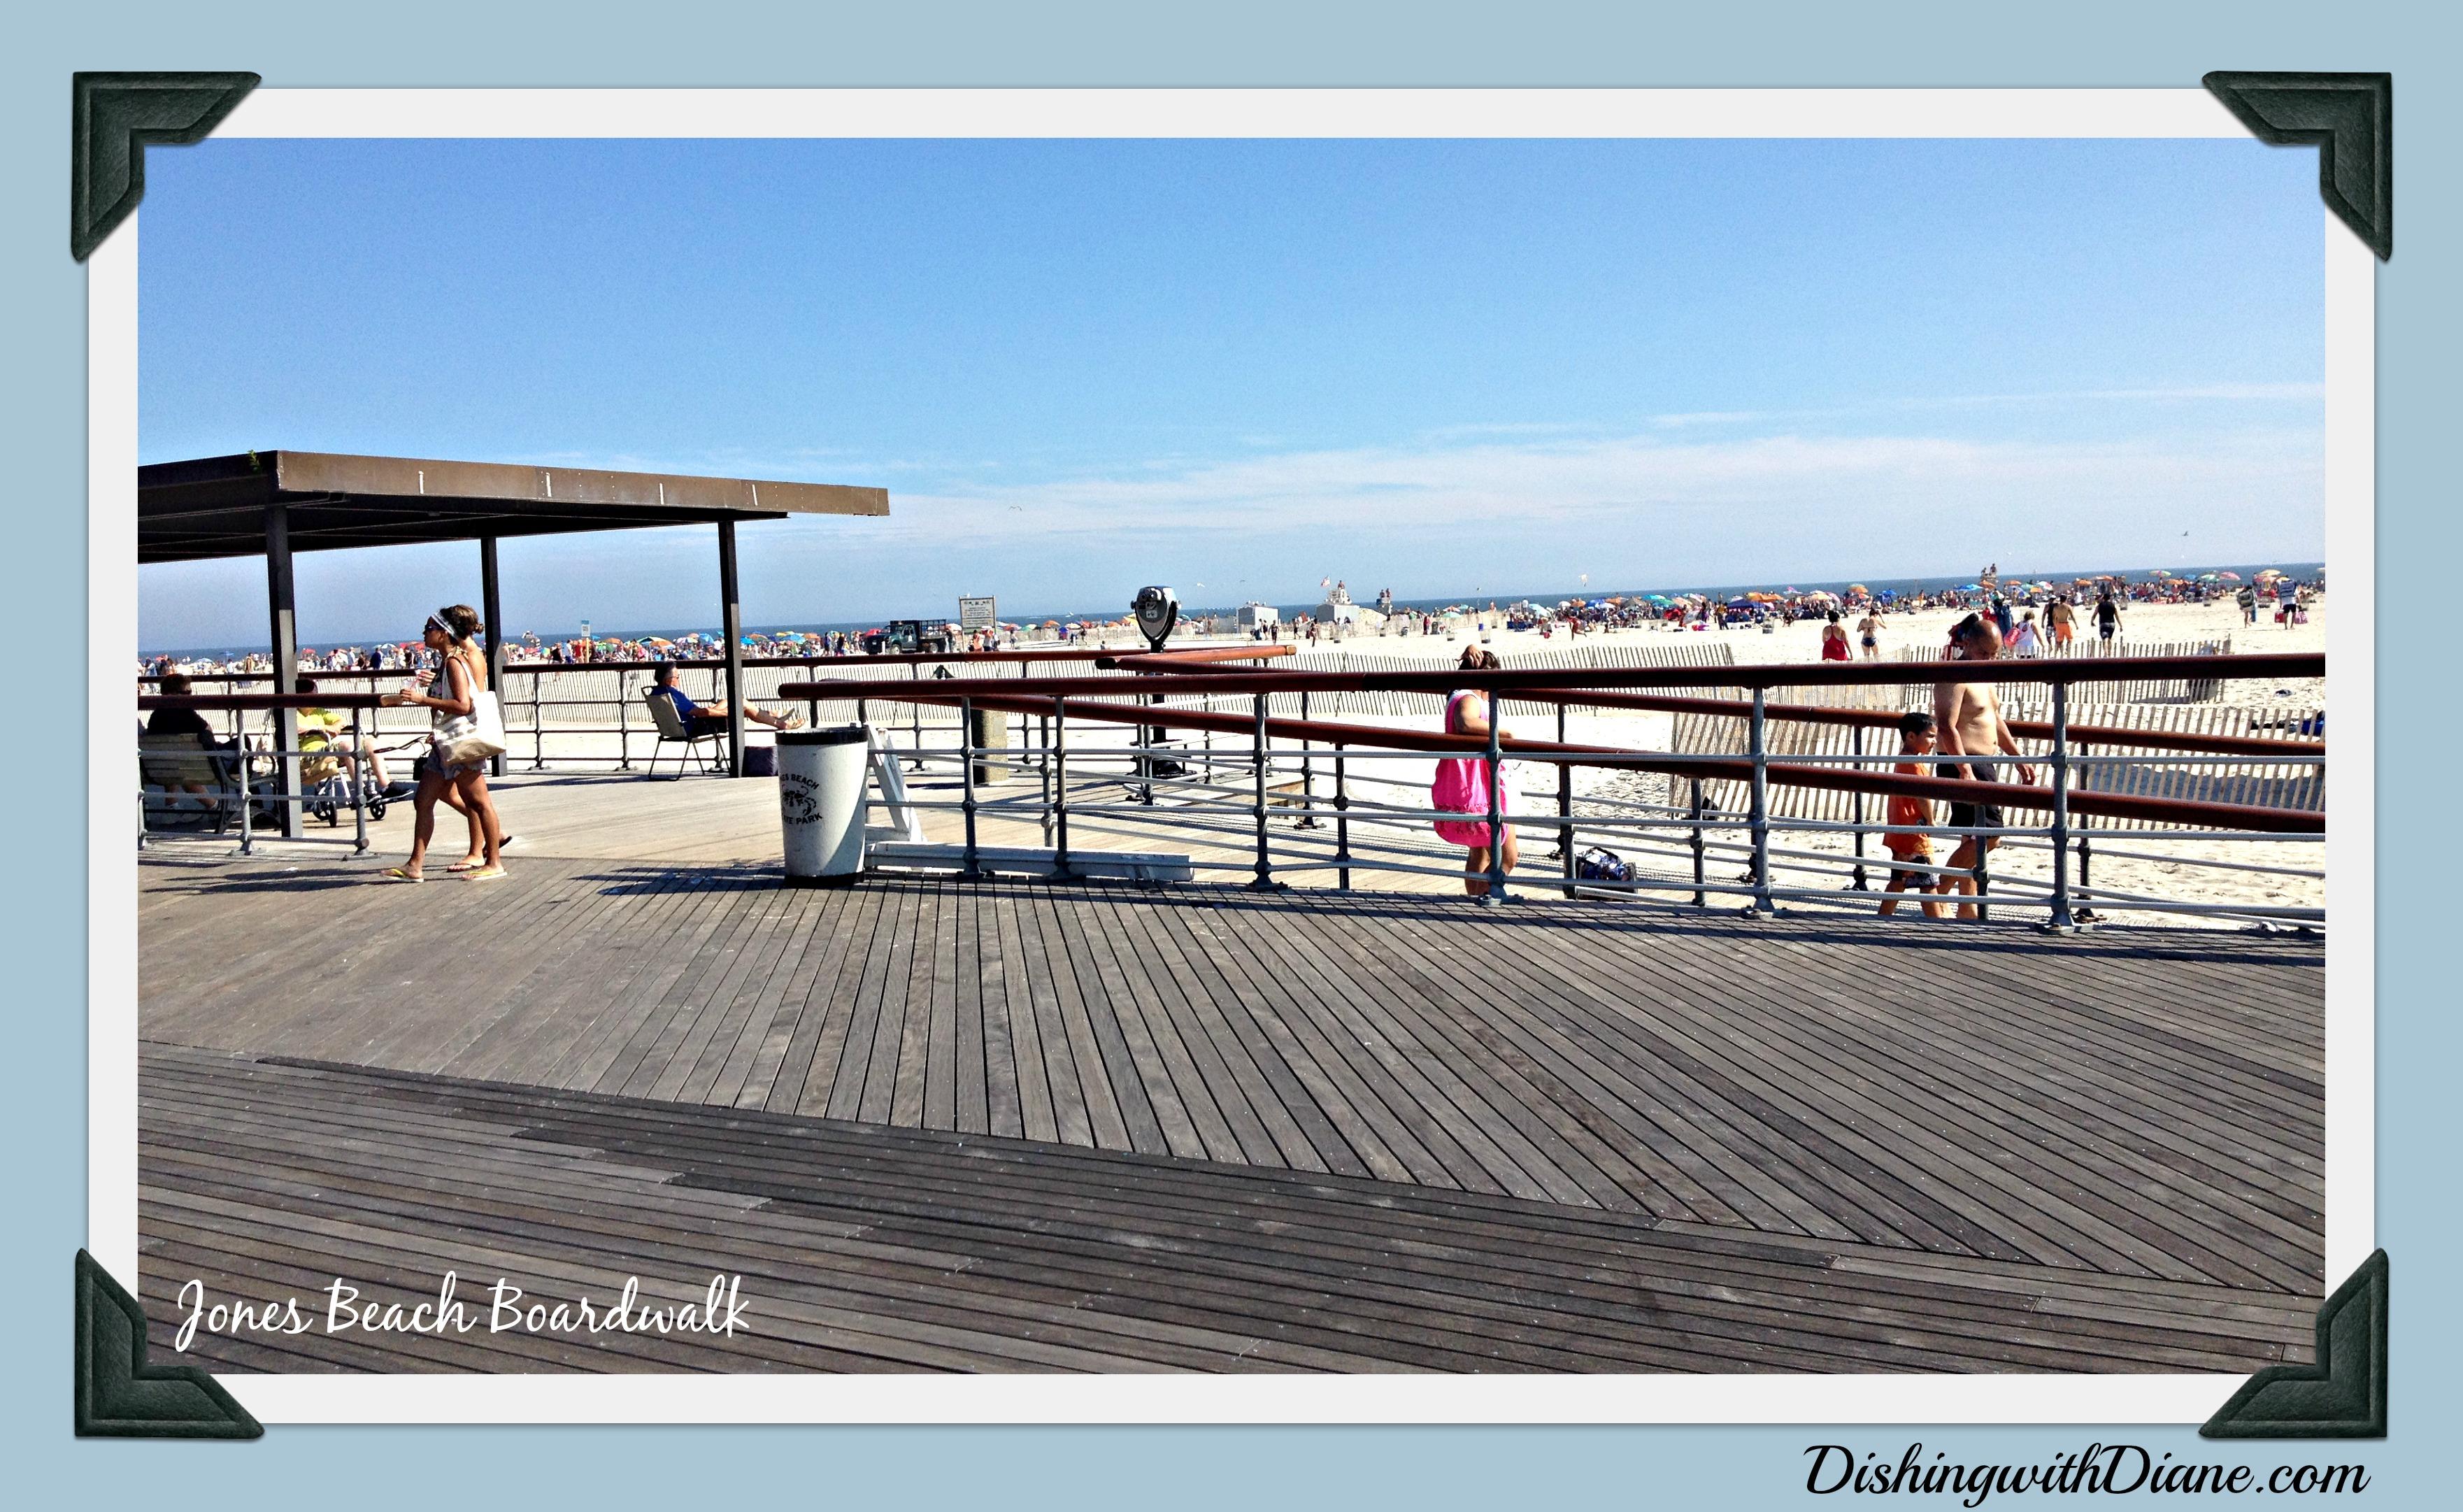 2014-09-01-15-47-16-jones-beach-boardwalk